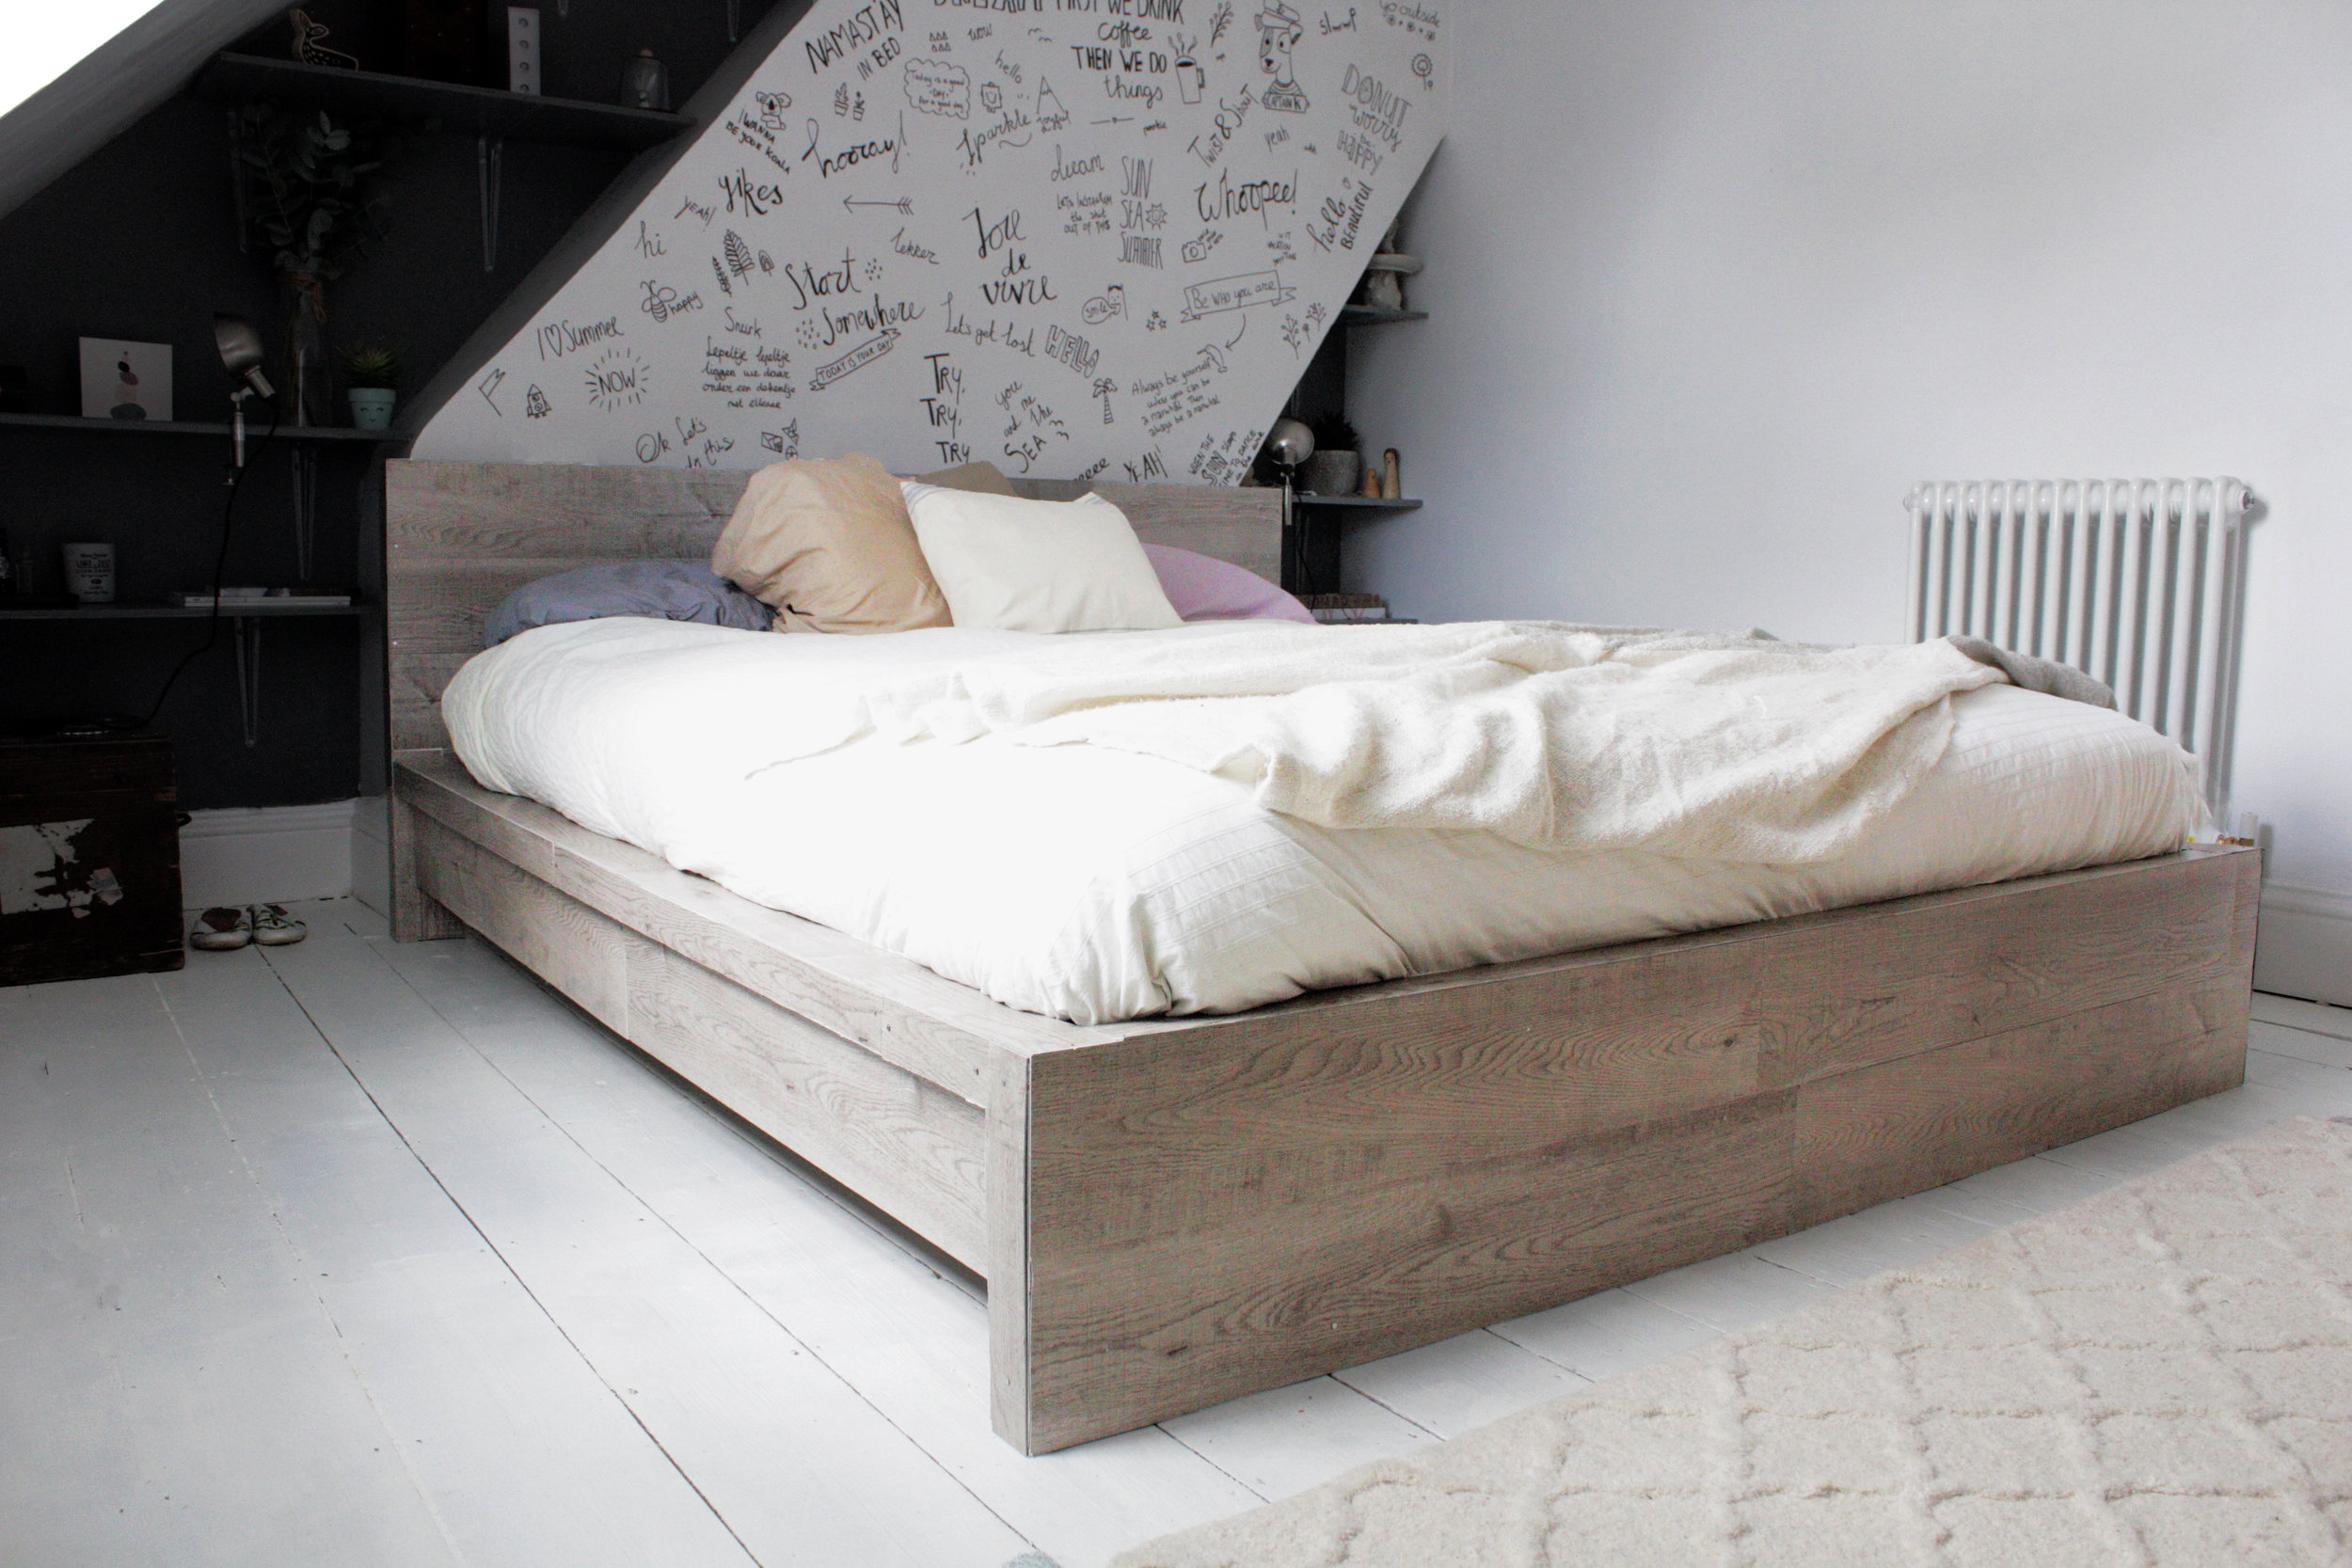 Hesteru0027s Handmade Home